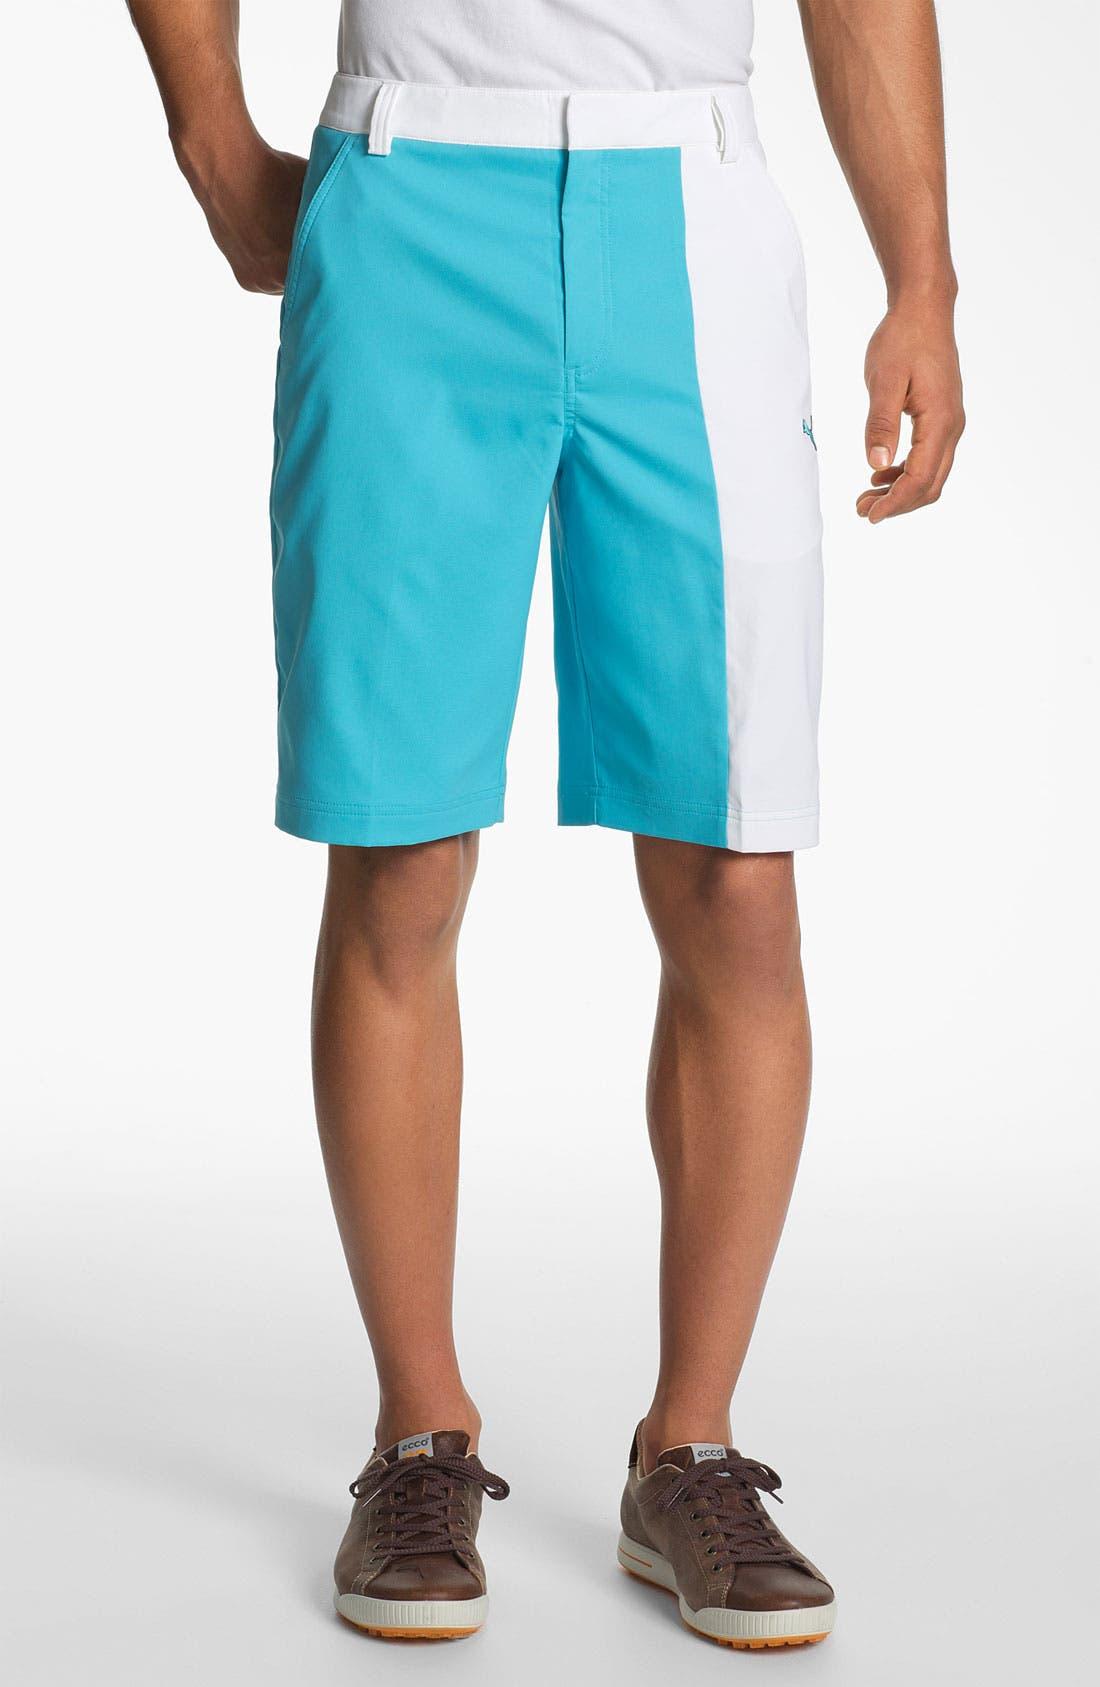 Main Image - PUMA GOLF 'New Wave' Golf Shorts